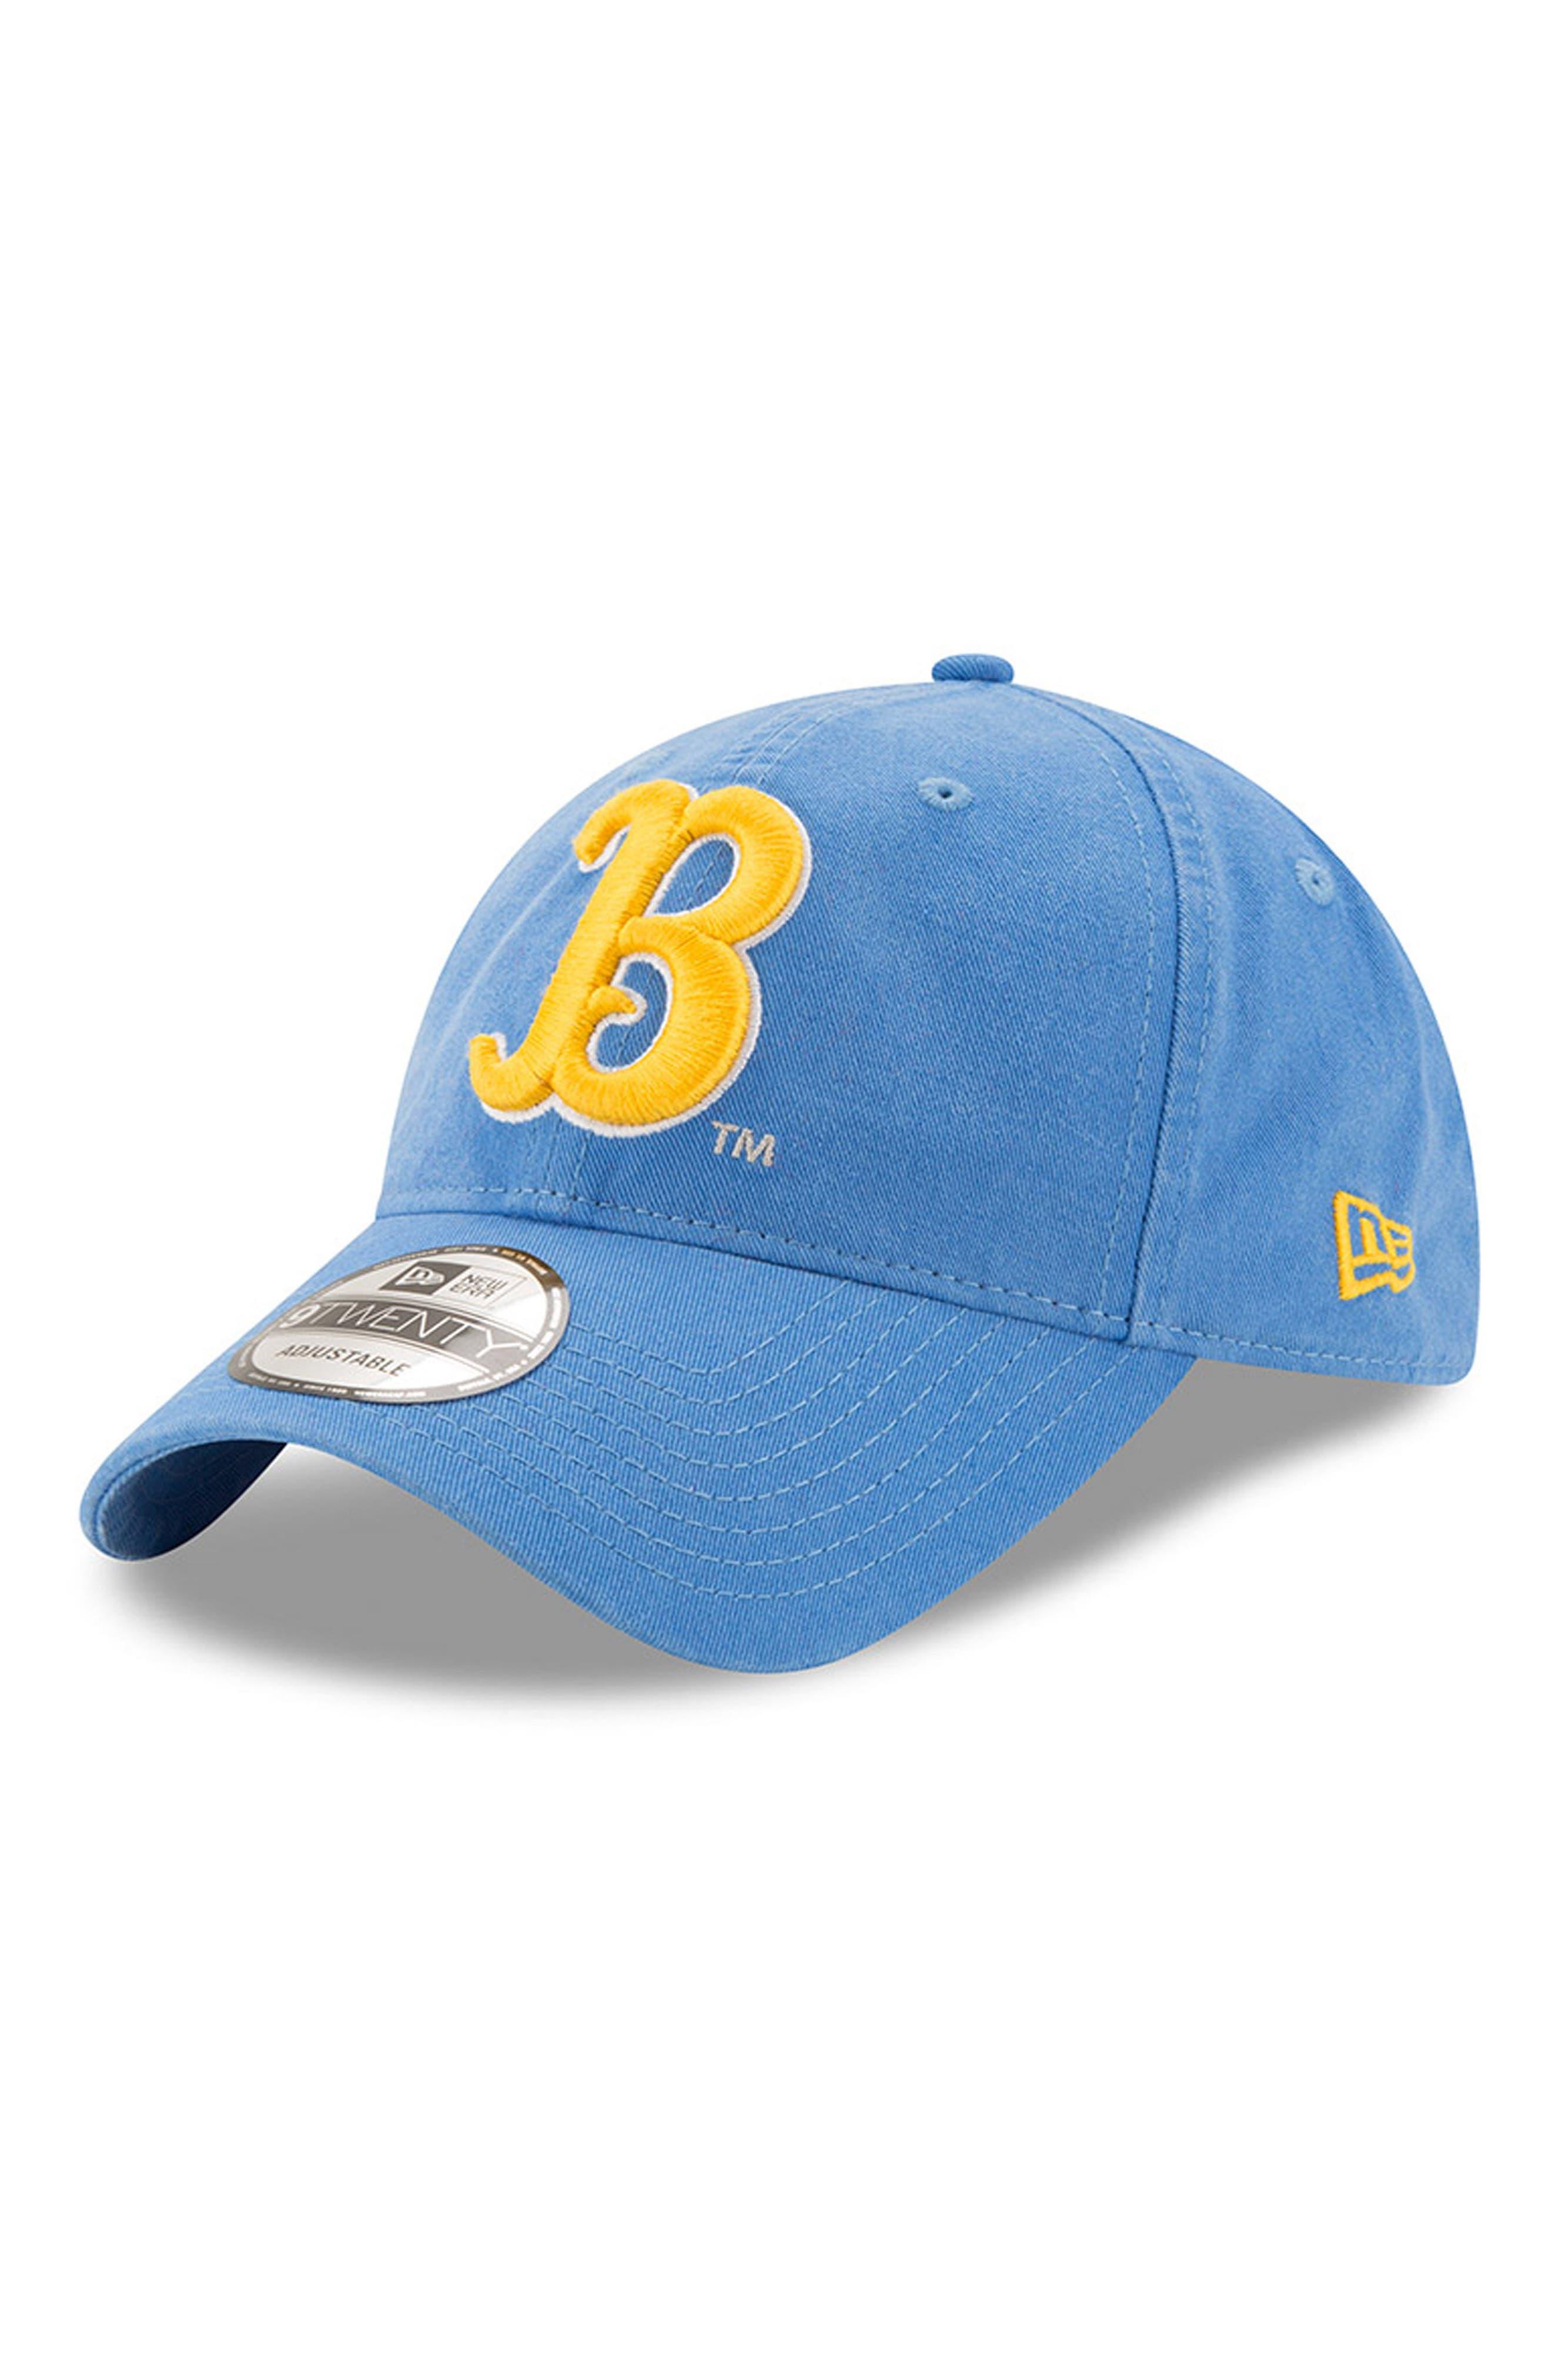 New Era Collegiate Core Classic - UCLA Bruins Baseball Cap,                         Main,                         color, Ucla Bruins